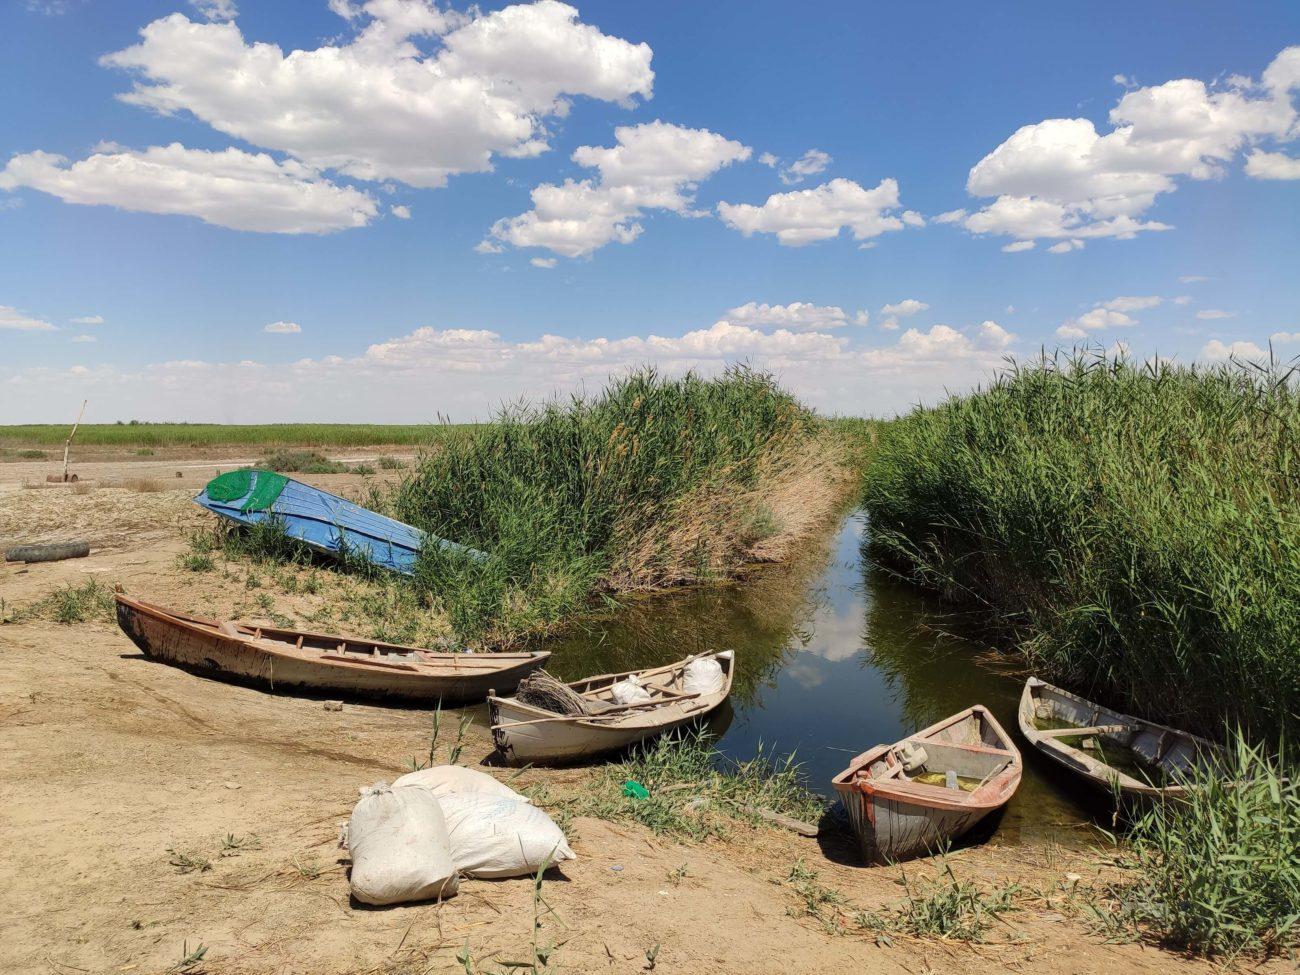 Bateaux de peche Ouzbékistan Sudochi lac Karakalpakstan